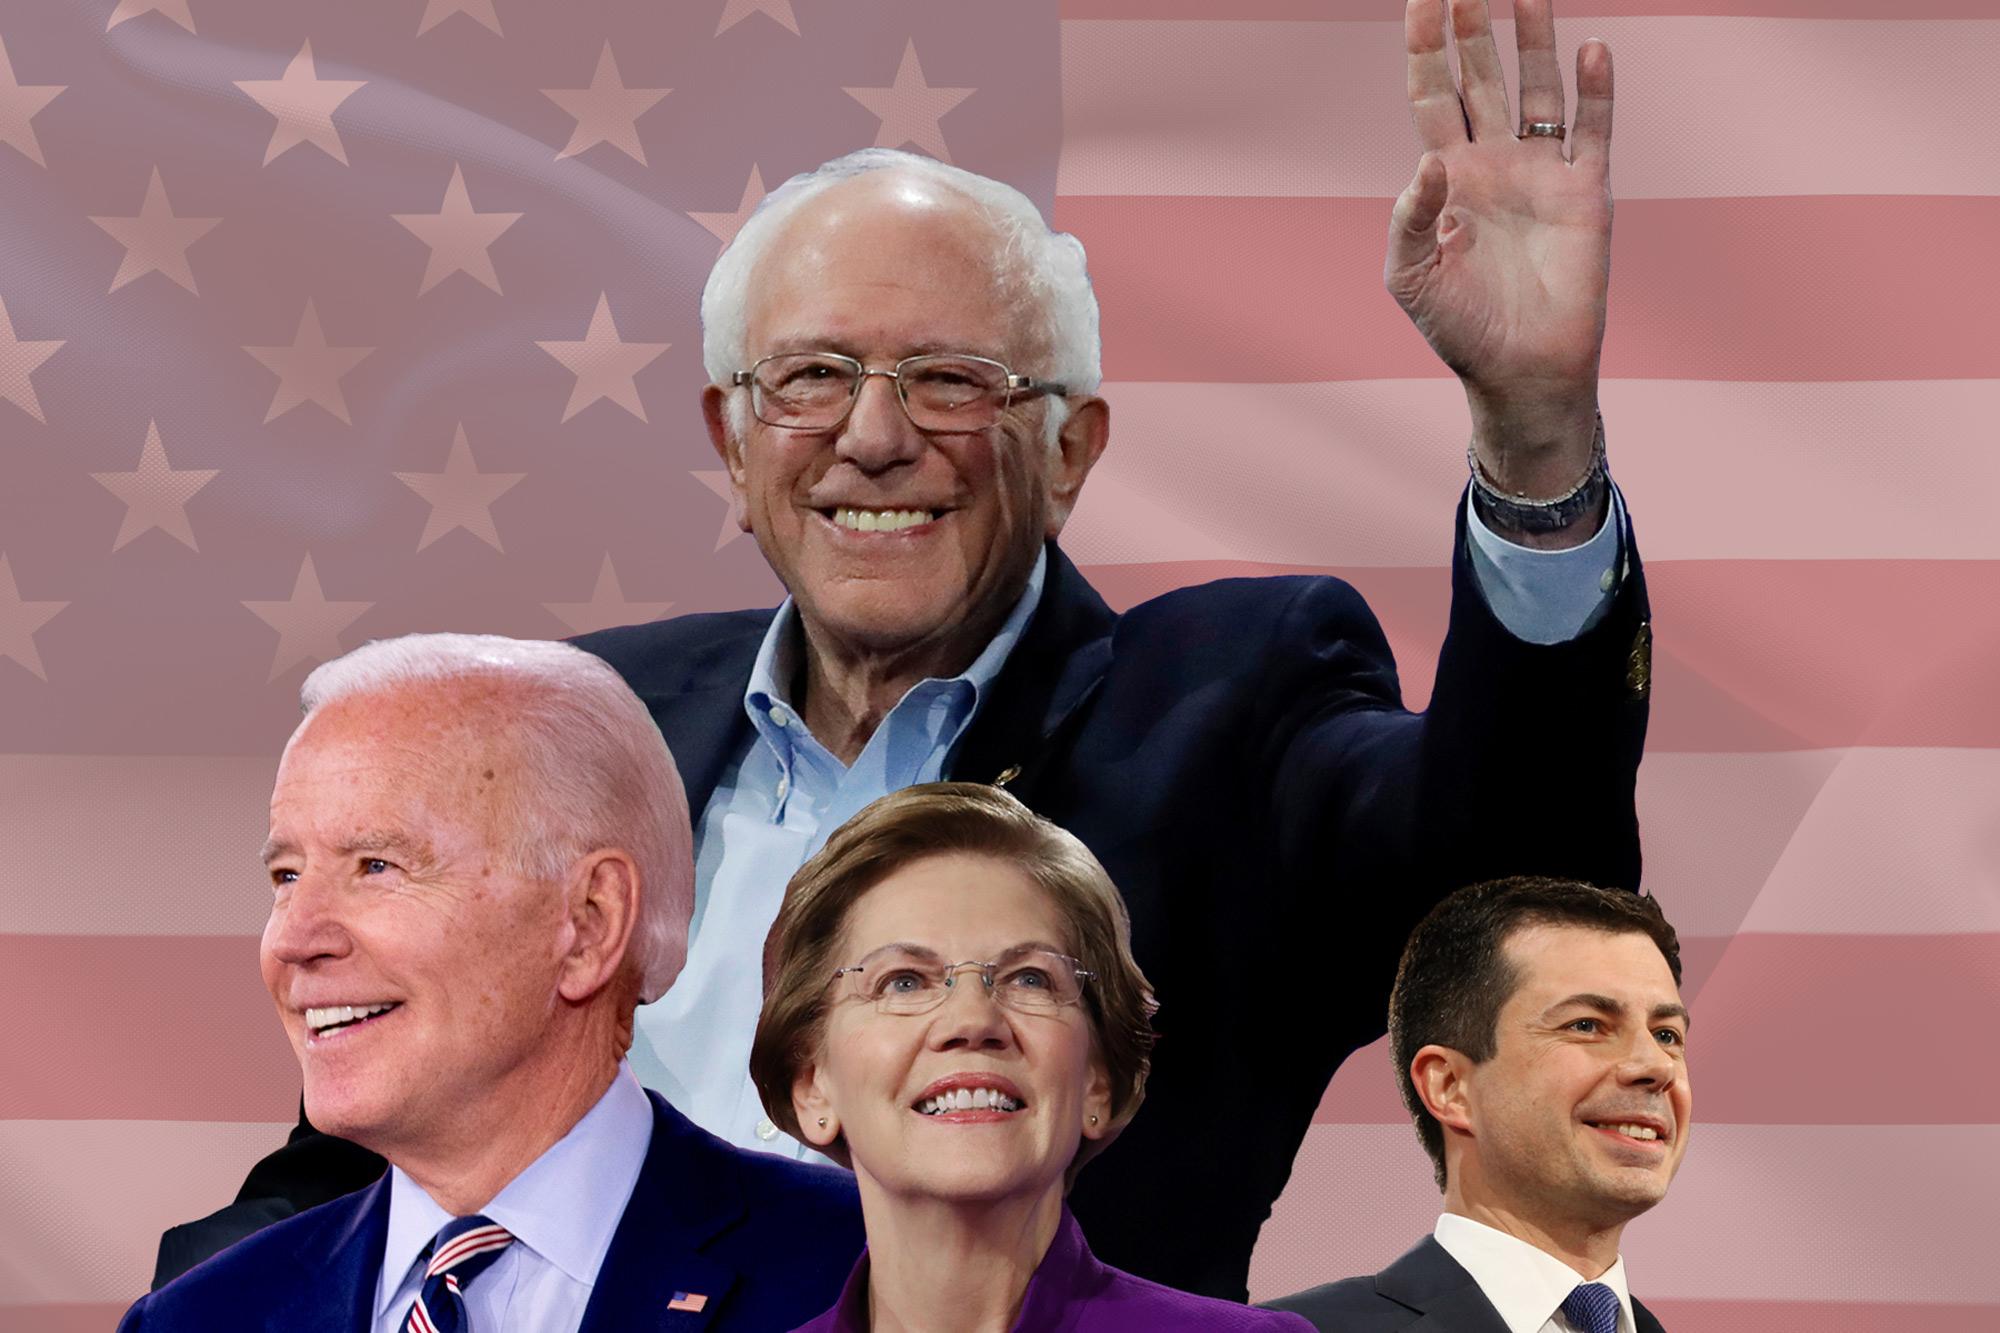 The RS Politics 2020 Democratic Primary Leaderboard